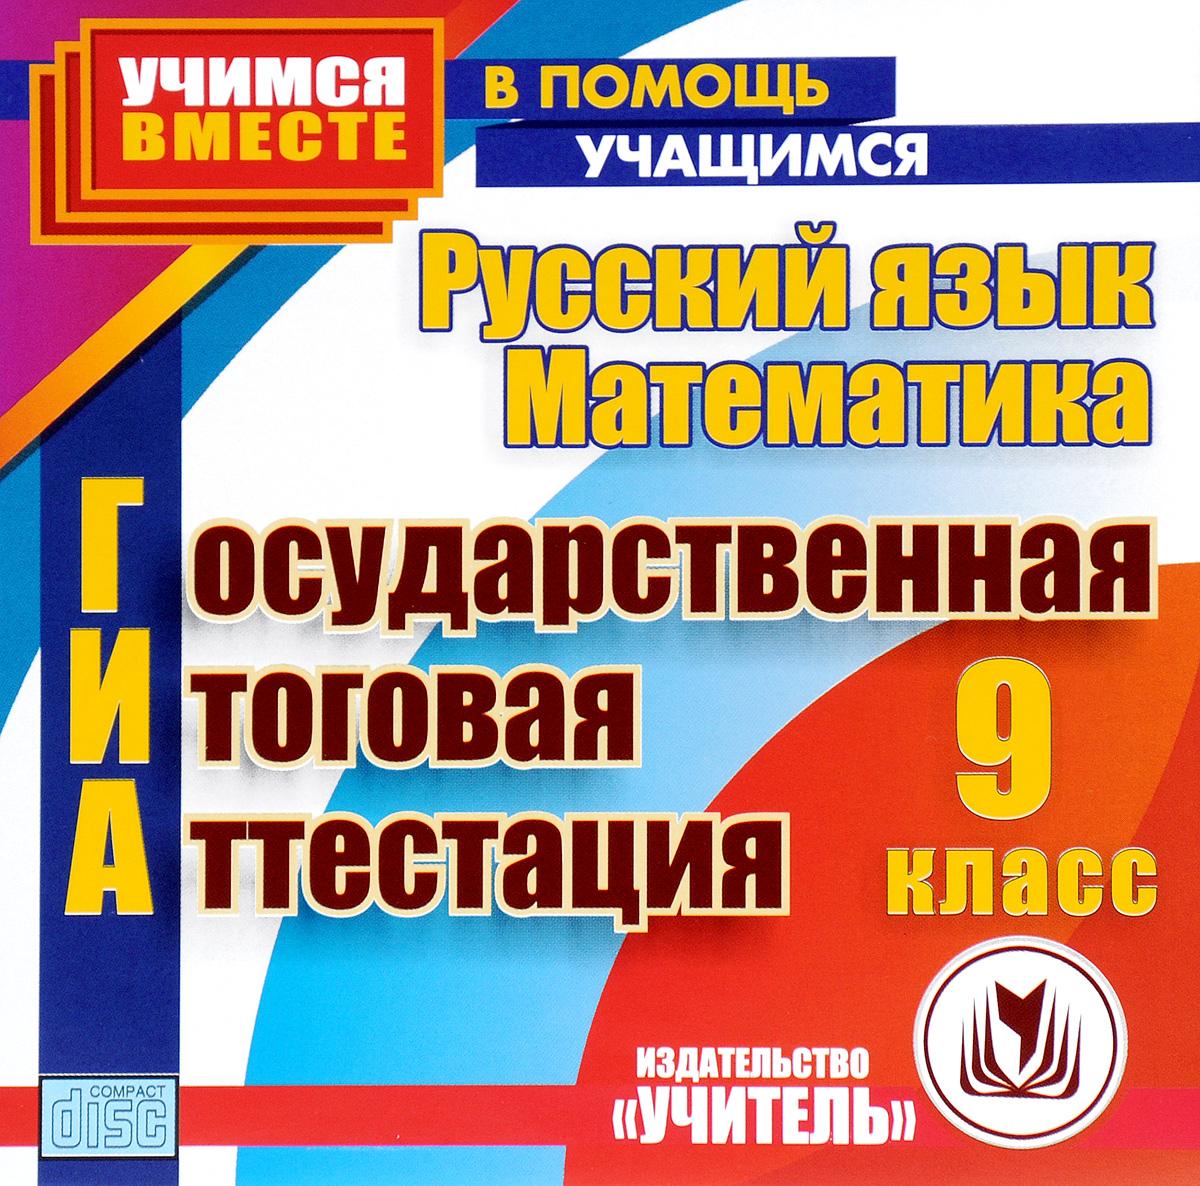 ГИА. Русский язык. Математика. 9 класс